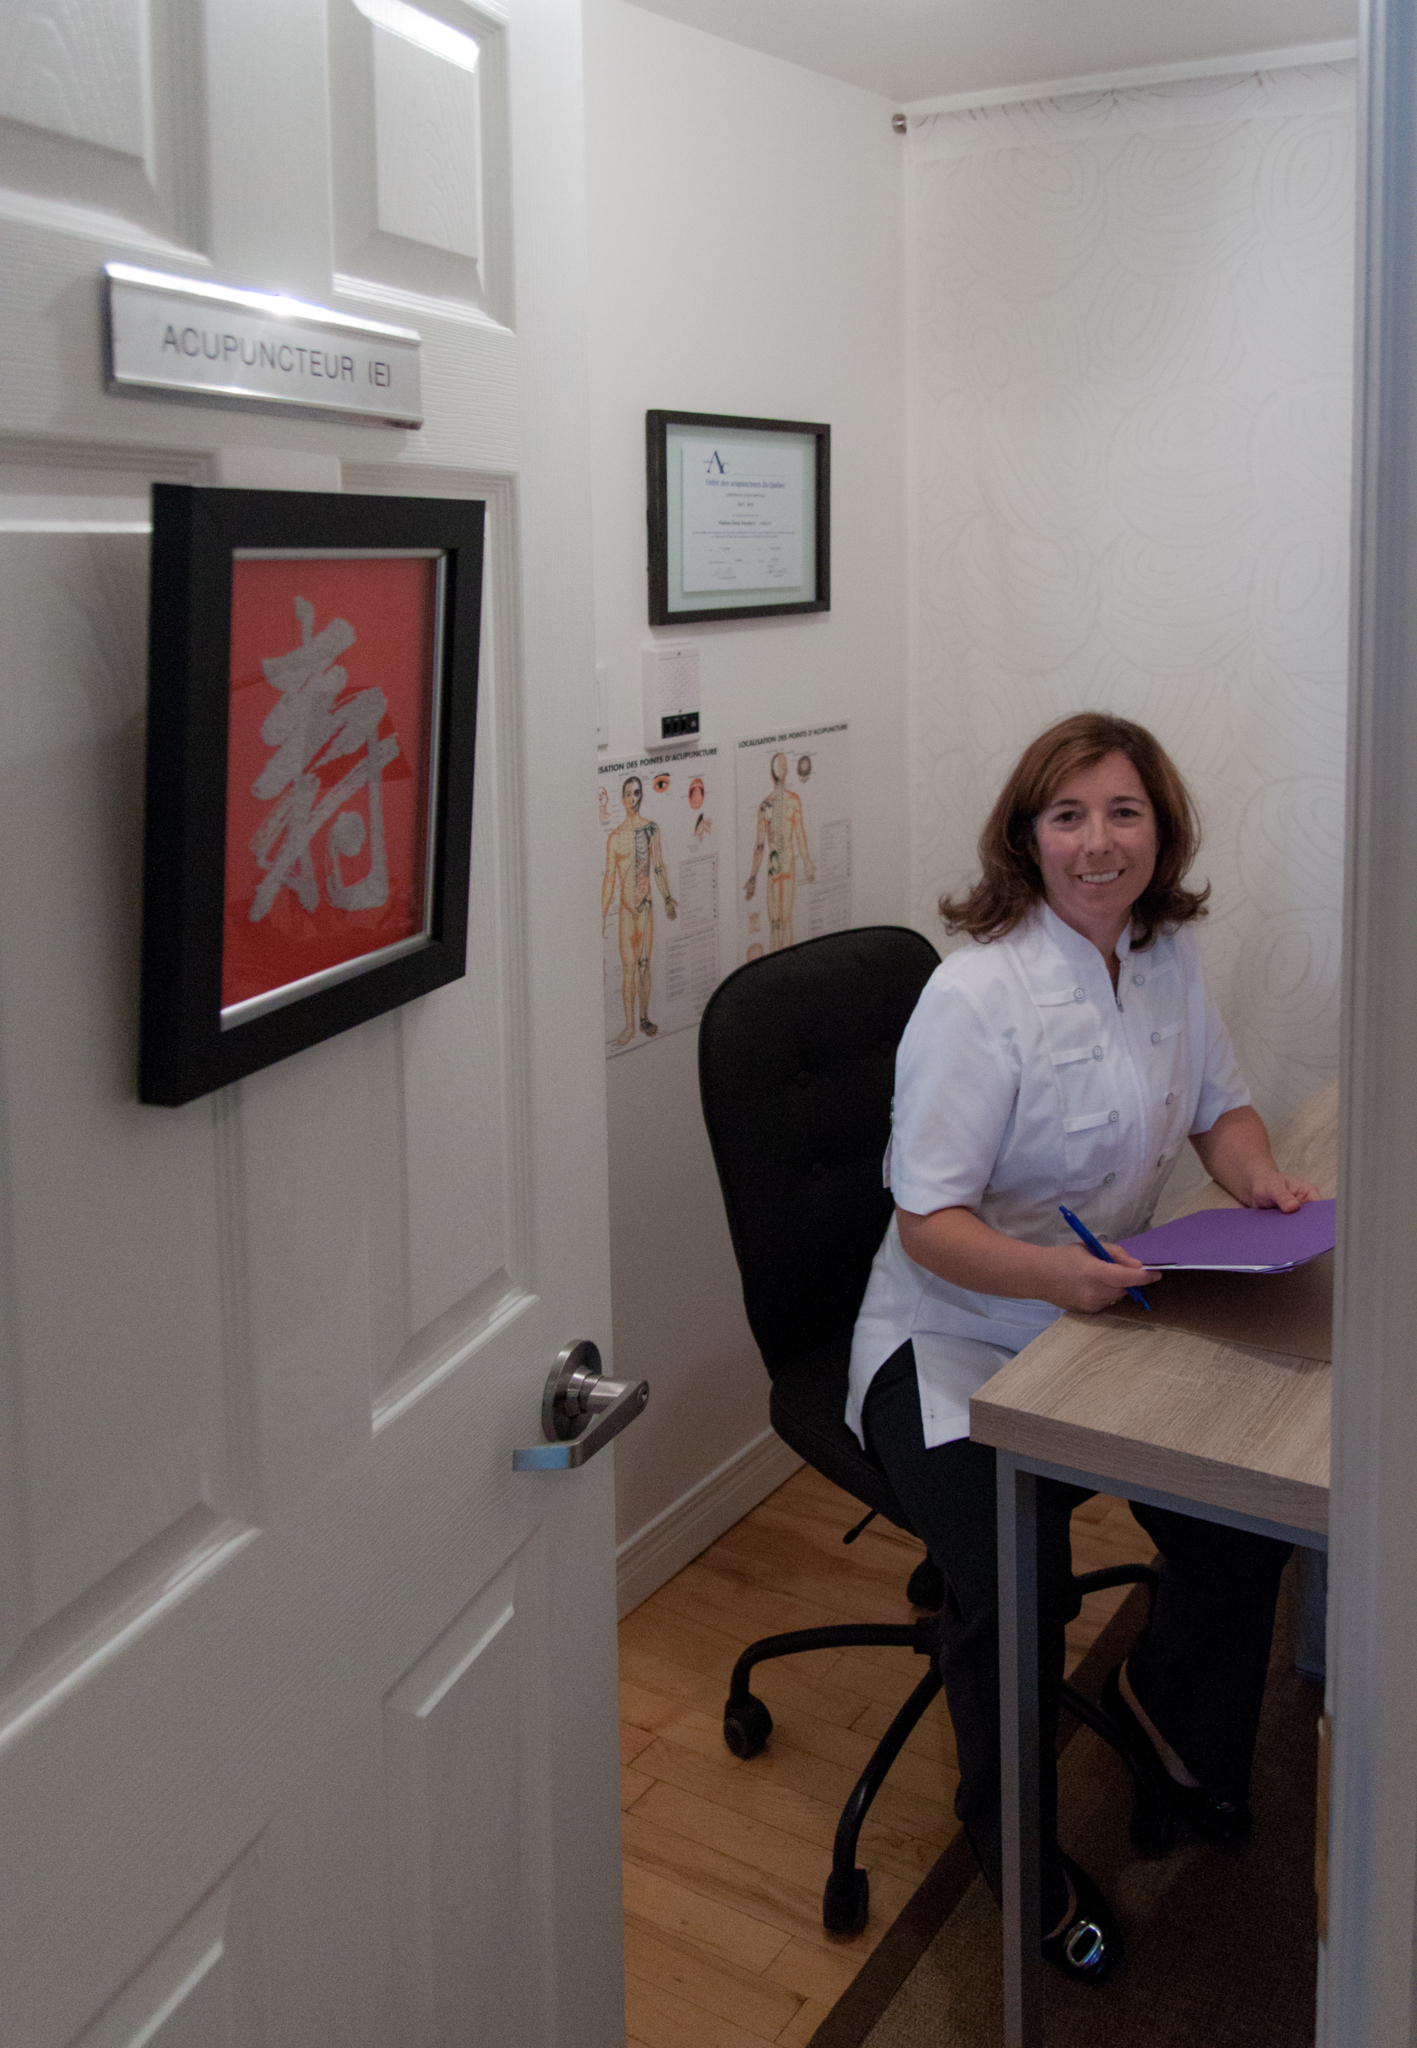 Isabelle Sirois Acupuncteure